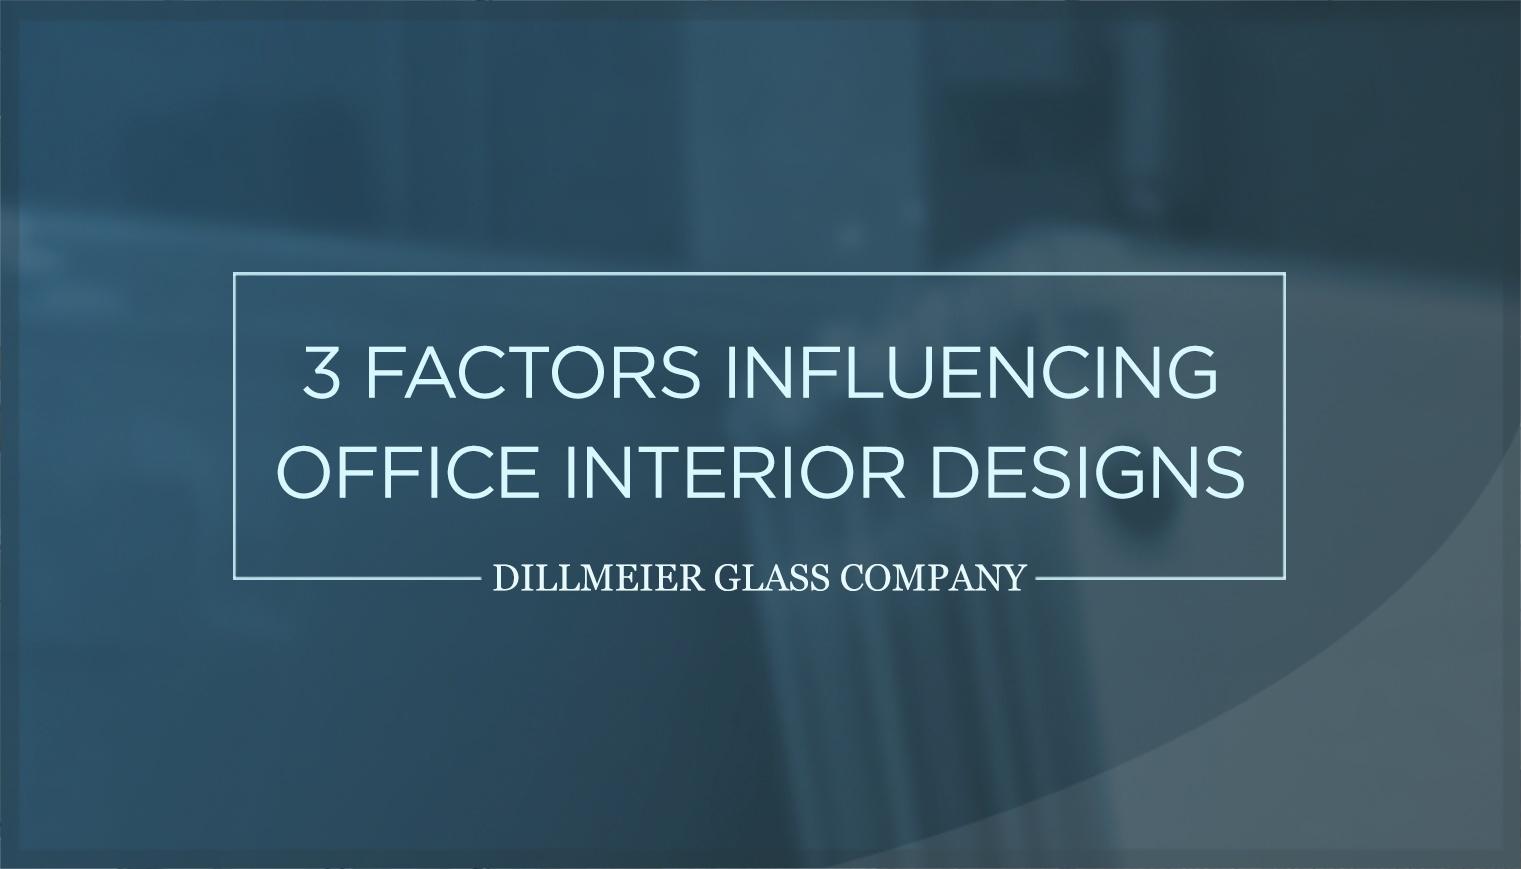 3 Factors Influencing Office Interior Designs